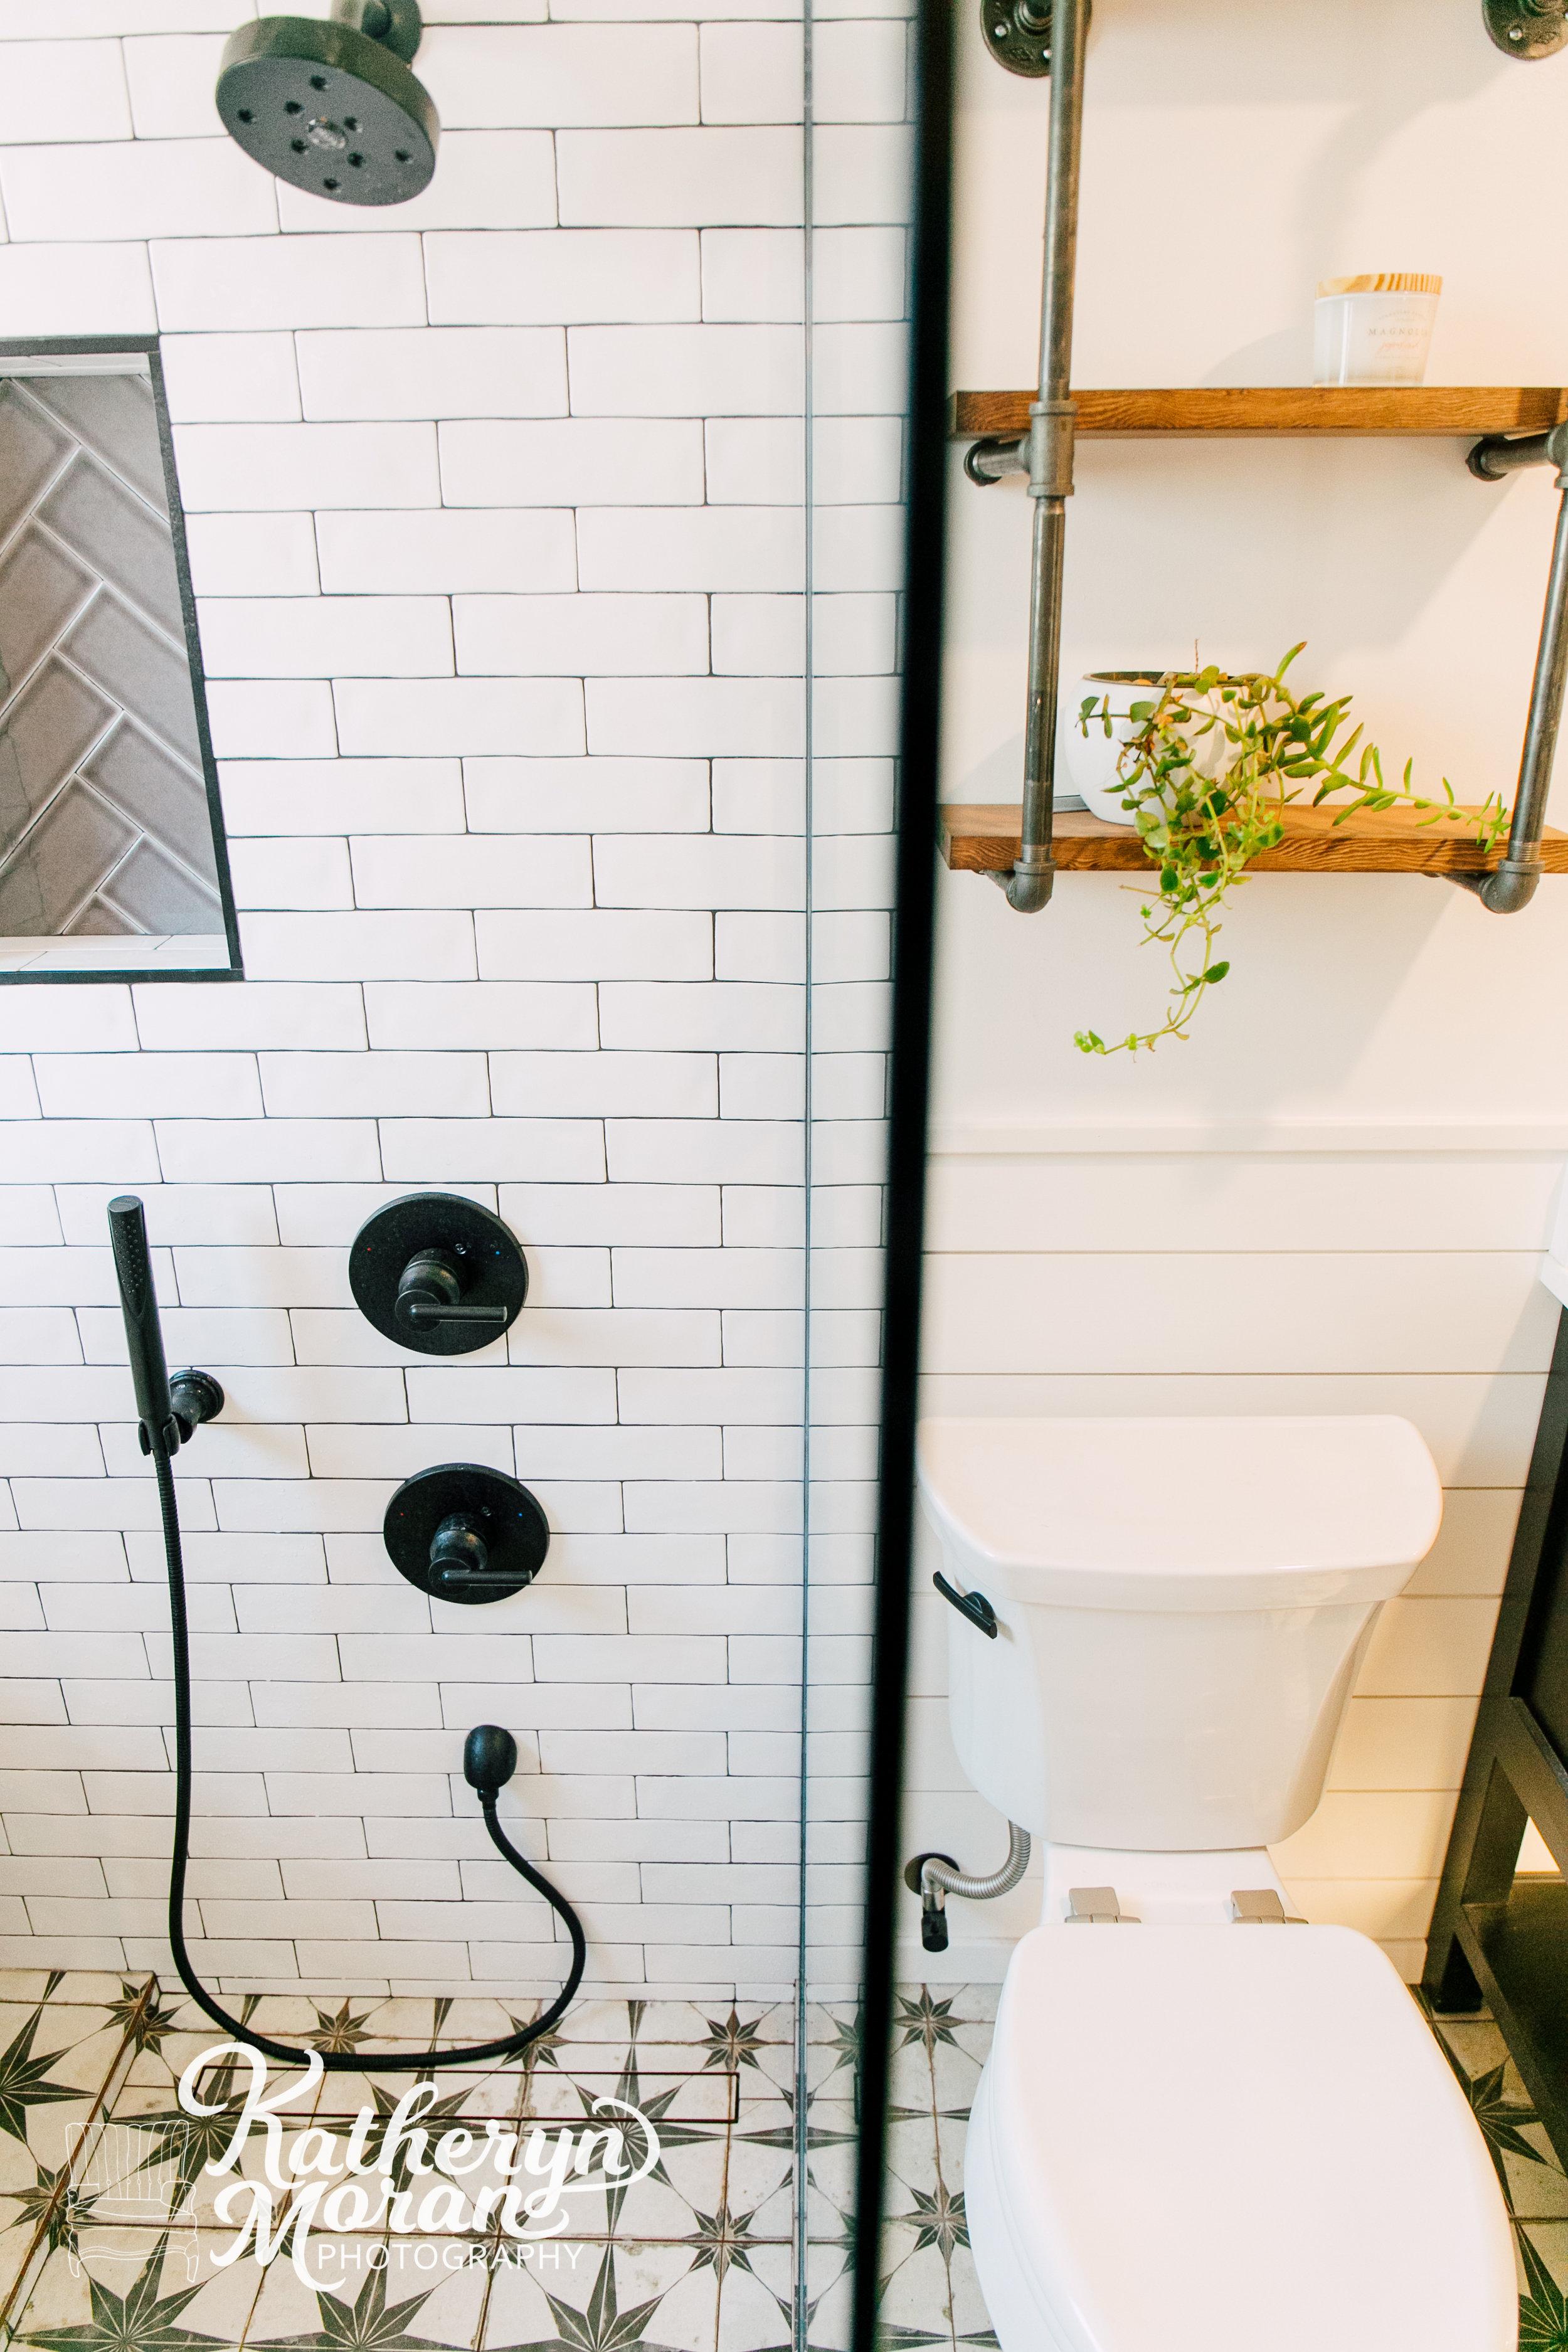 ferndale-elder-road-bathroom-jennifer-ryan-designs-katheryn-moran-april-2019-14.jpg